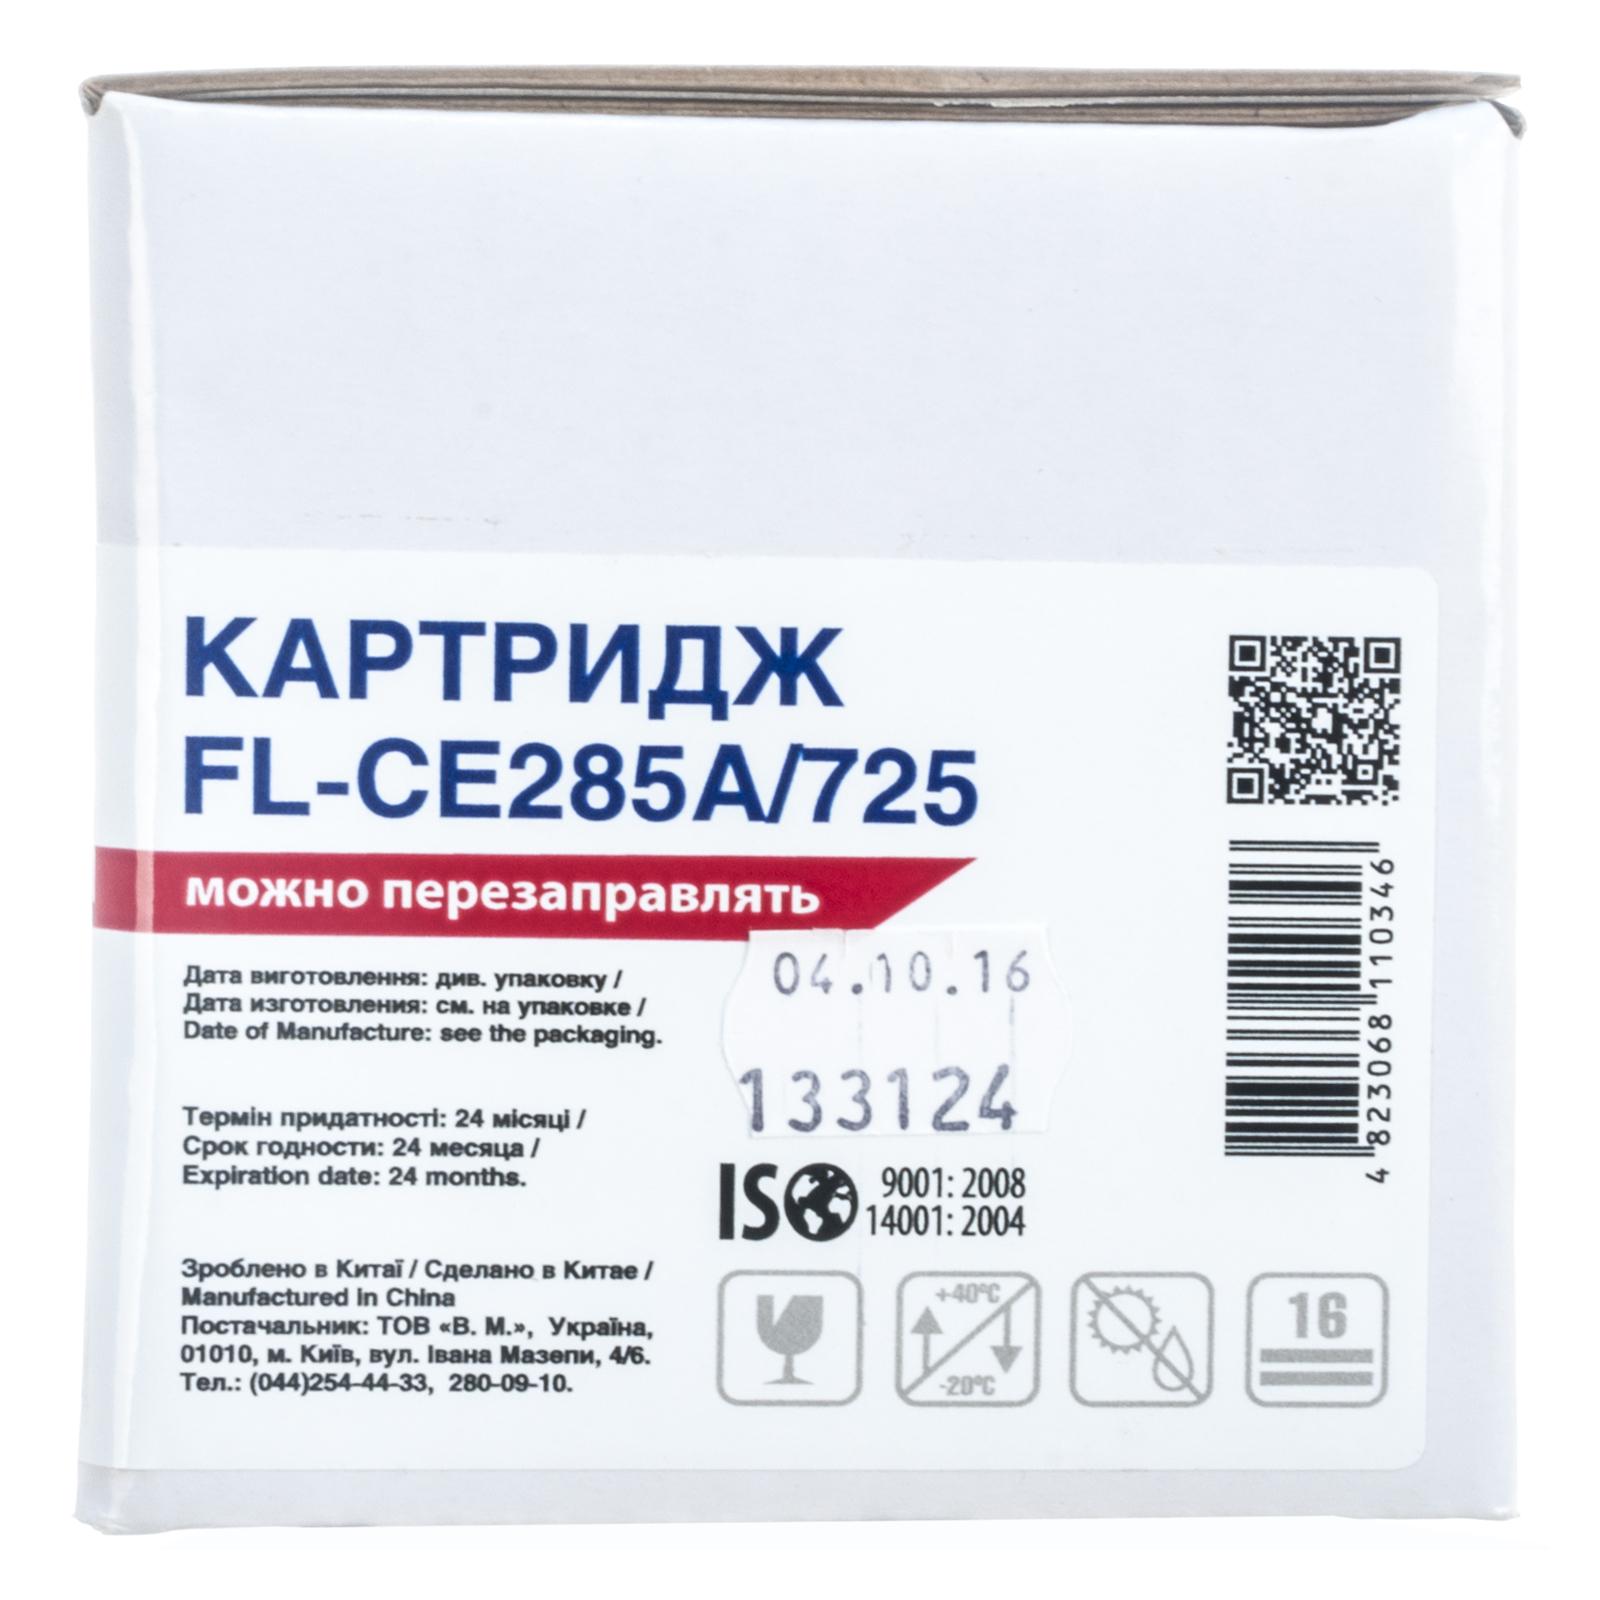 Картридж FREE Label HP LJ CE285A/CANON 725 (FL-CE285A/725) изображение 3